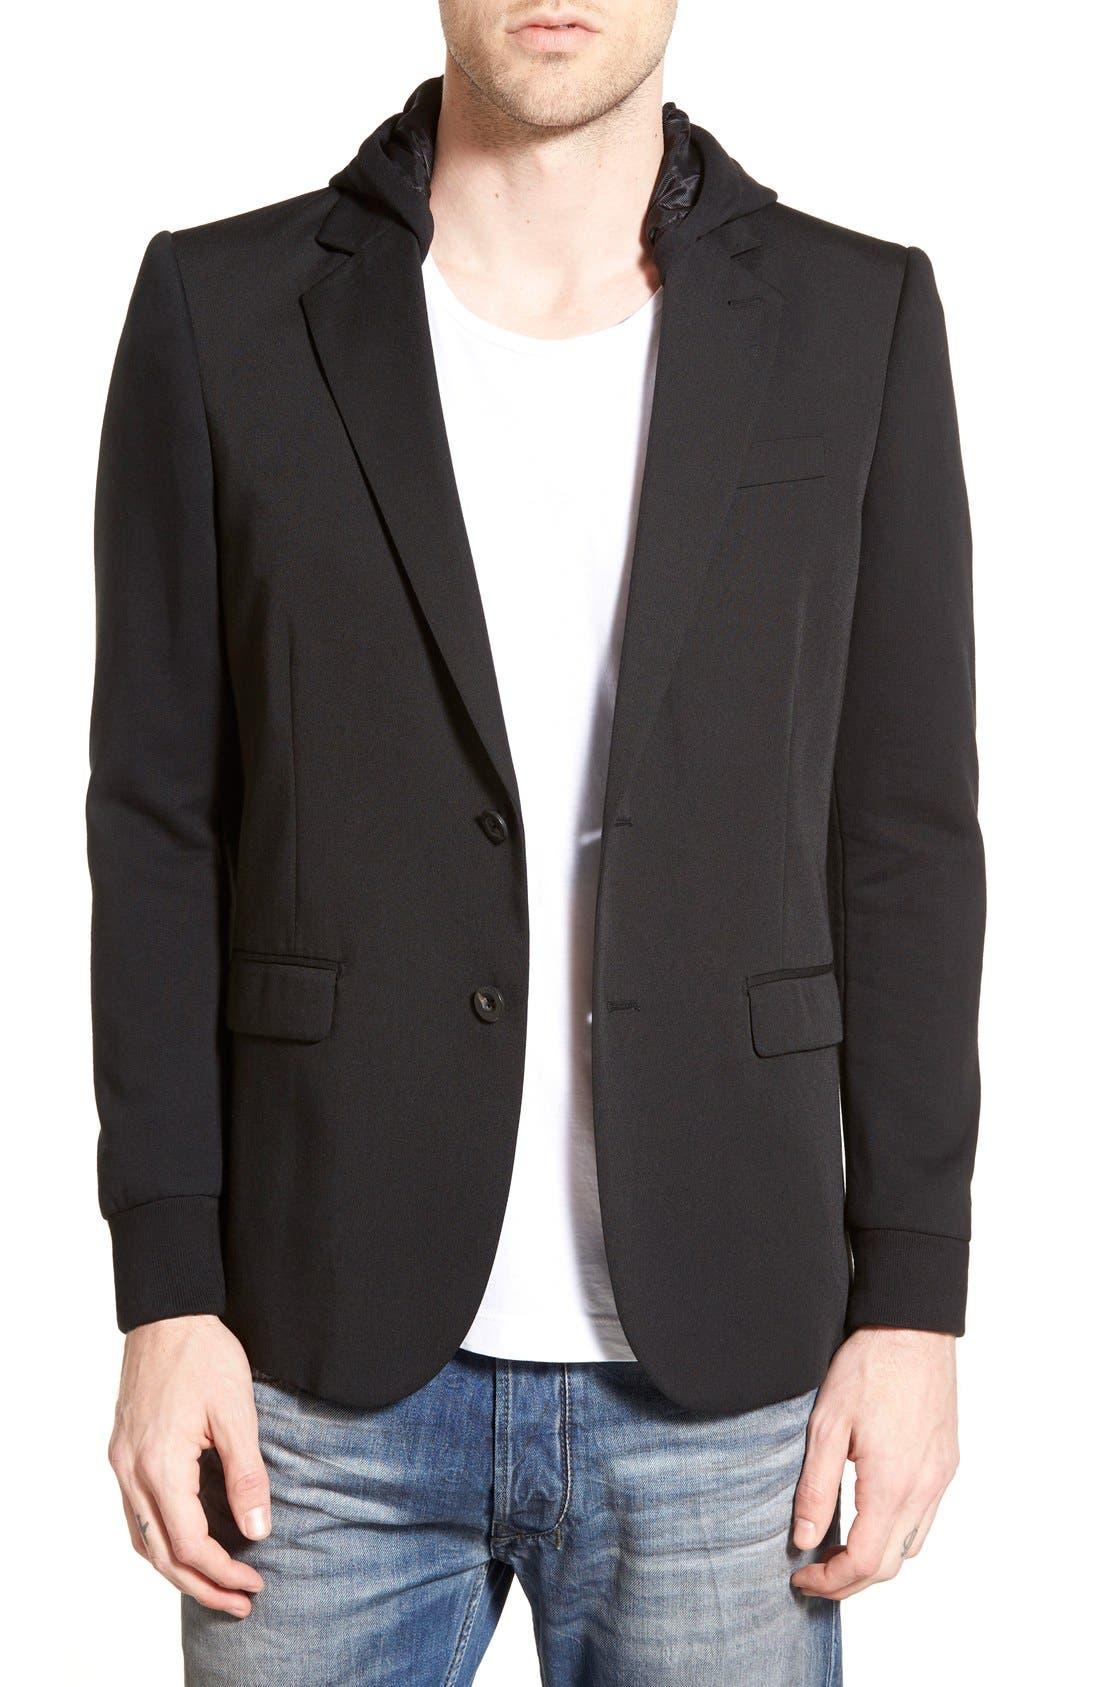 DIESEL<SUP>®</SUP> 'J-Swesl' Hooded Blazer, Main, color, 001